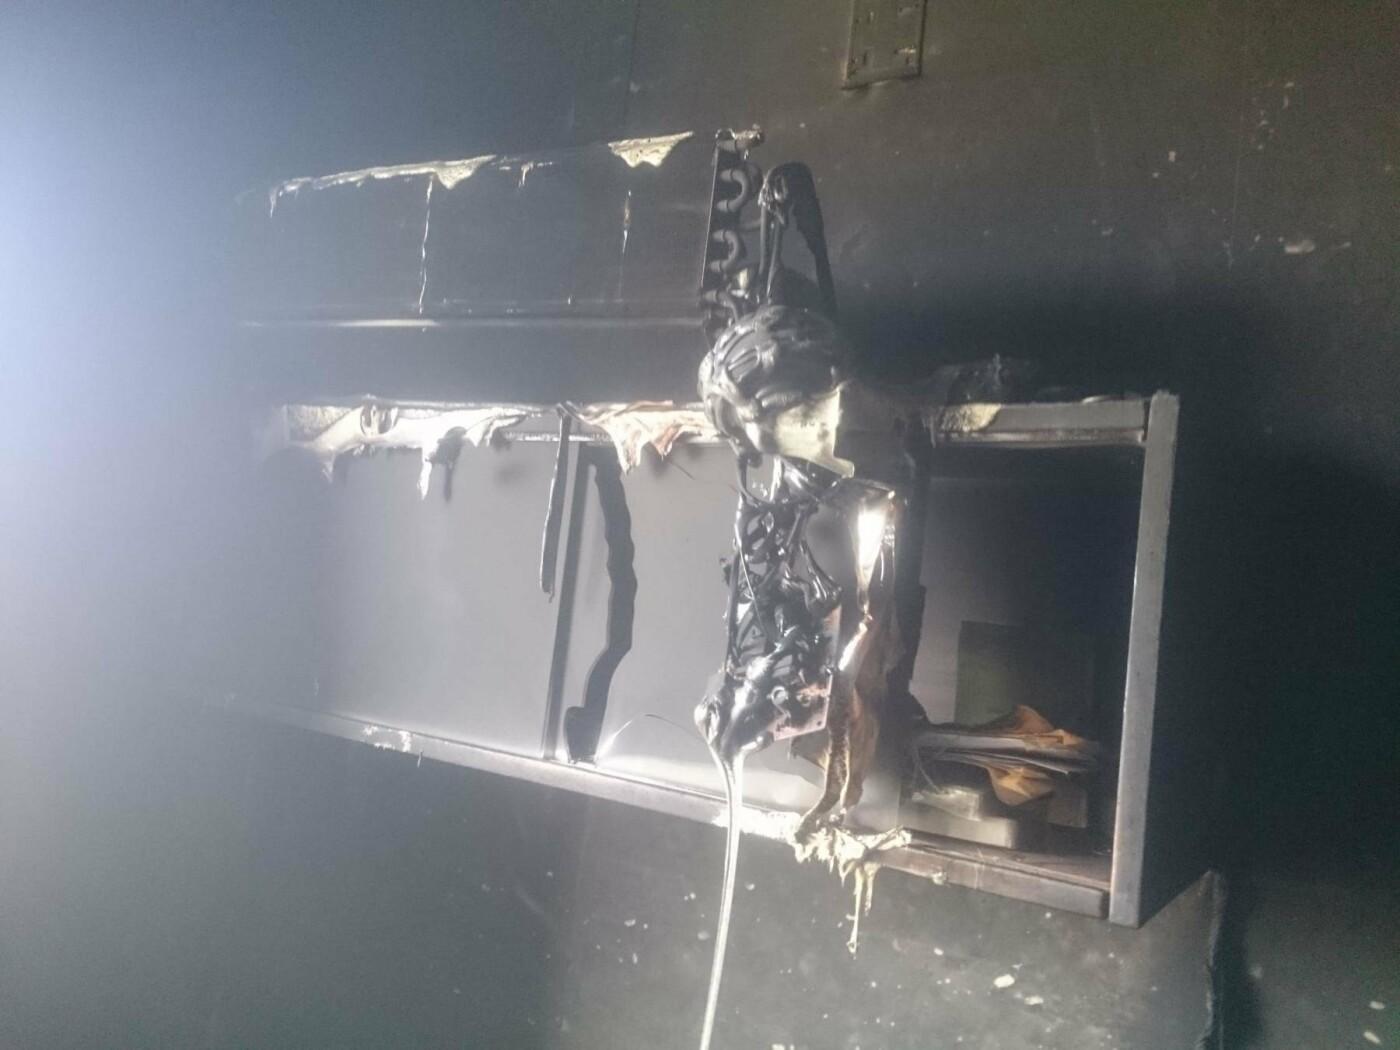 В Мариуполе при пожаре в квартире погибли два человека (ФОТО), фото-1